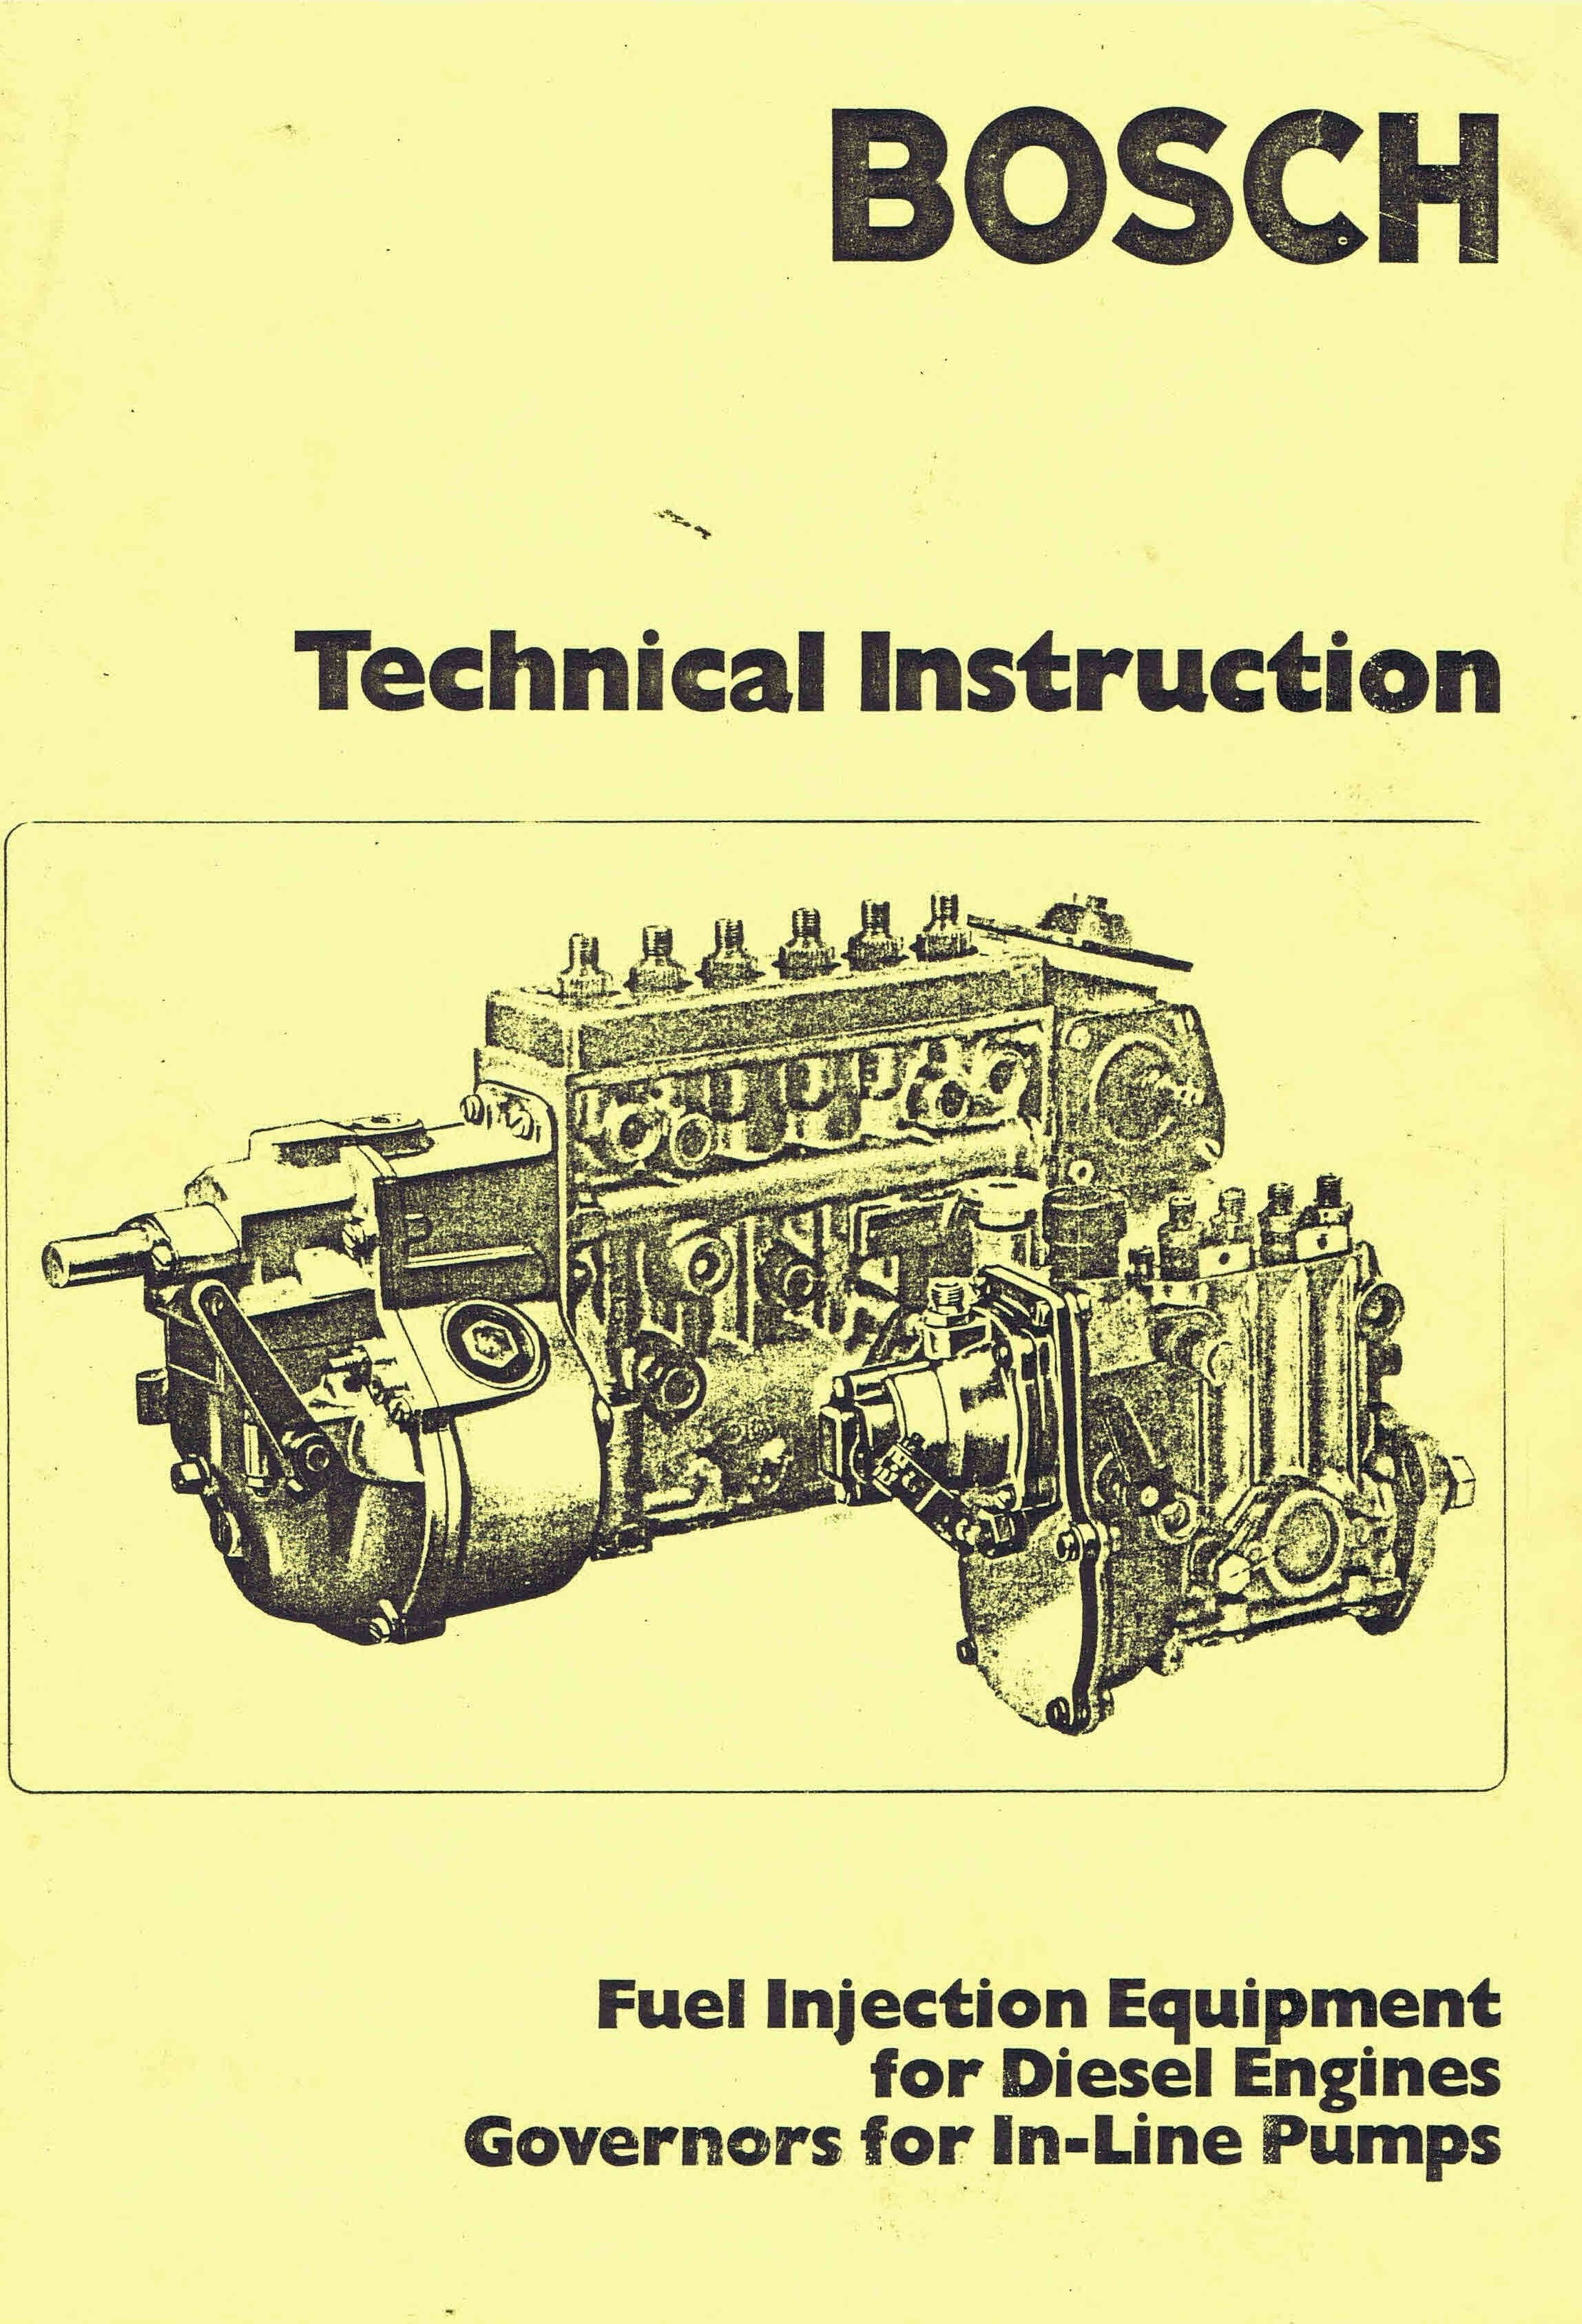 bosch diesel fuel pump manuals for mechanics rh sellfy com bosch vp37 diesel pump repair manual bosch ve diesel pump manual